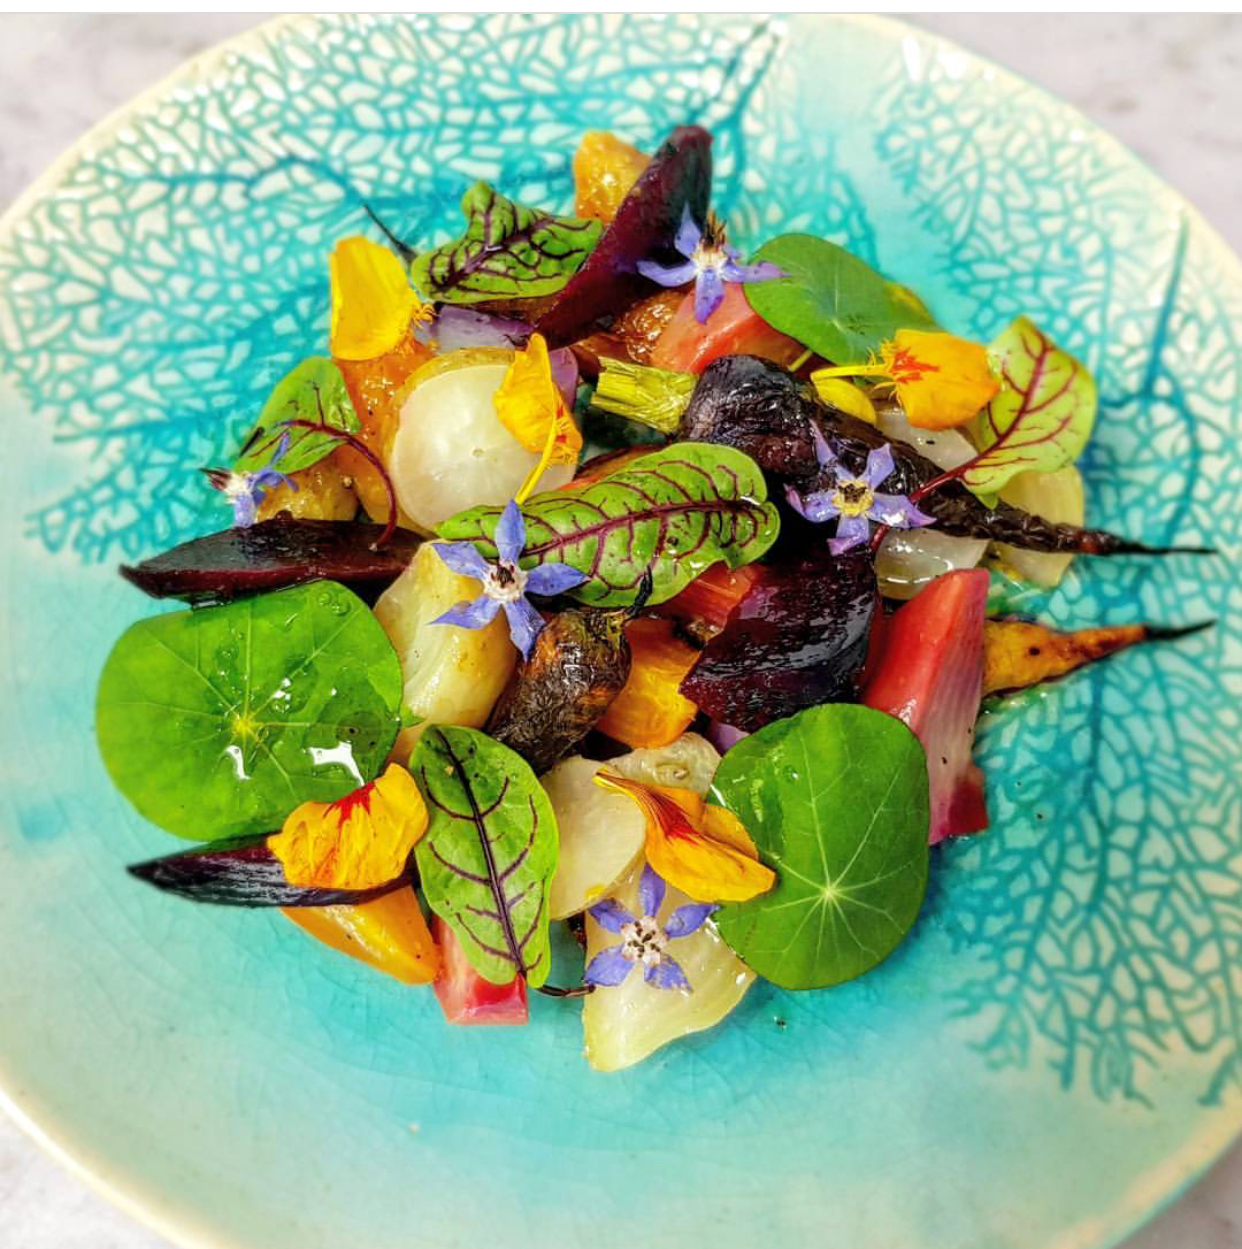 Wholesale Ceramic Plates for Restaurants -